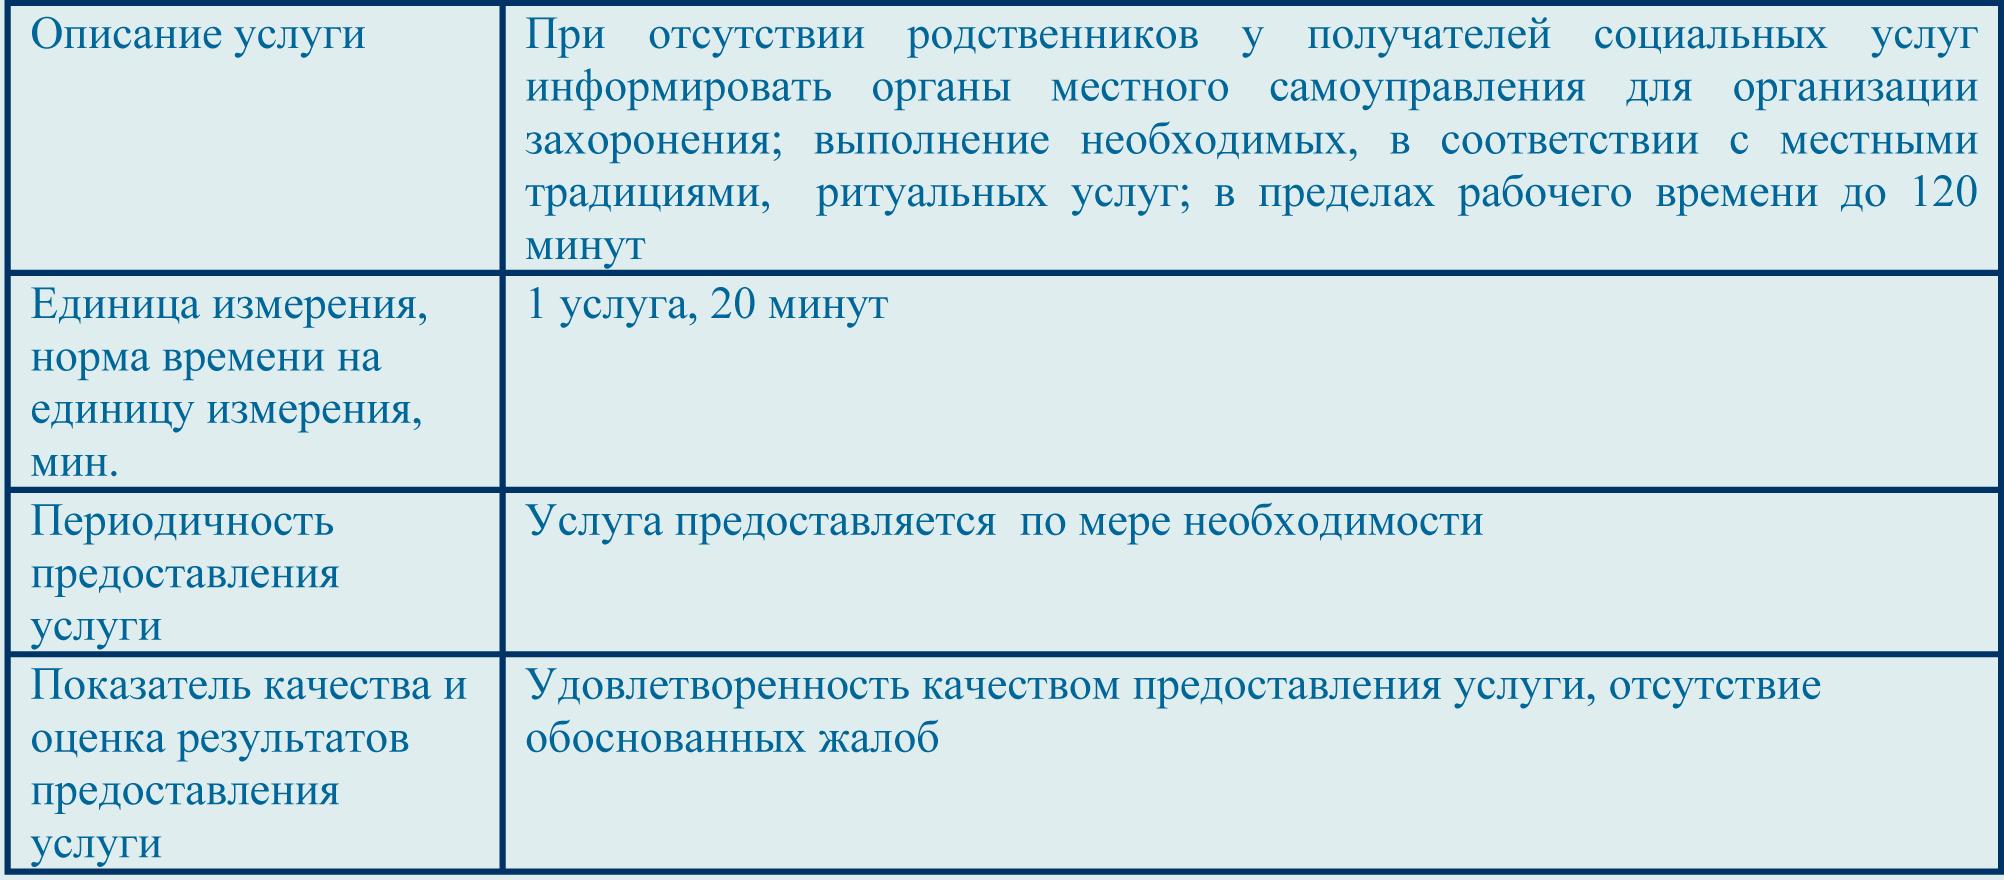 opisanie-uslug-csonekl4